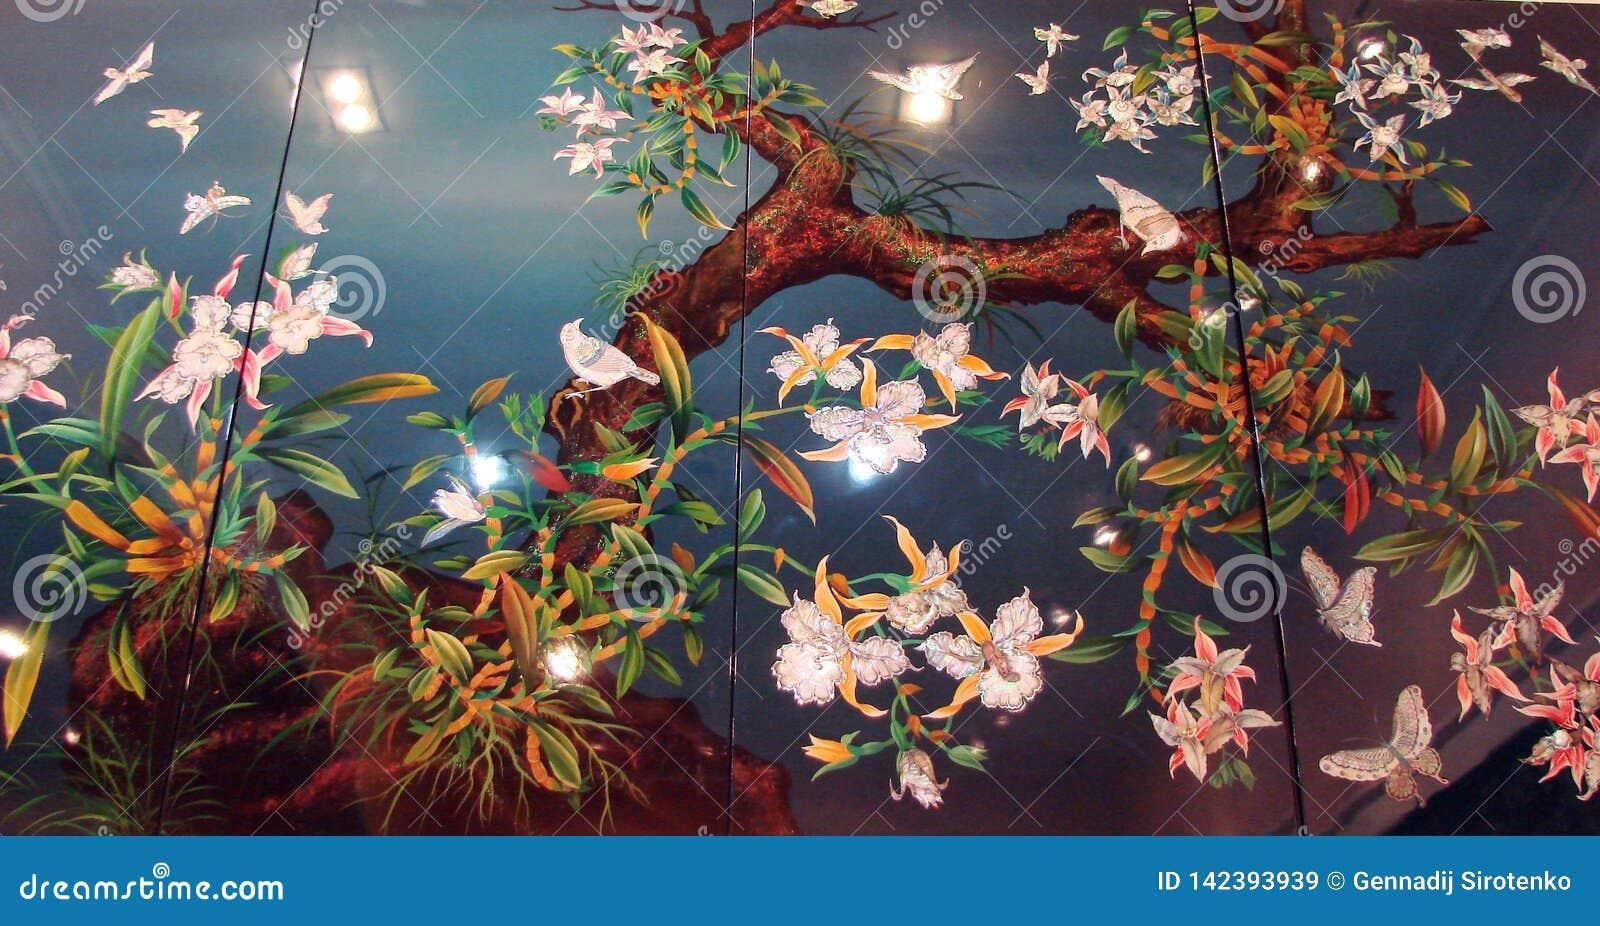 Ho Chi Minh City Vietnam Landschaften der Stadt, religiöse Tempel, Illustrationen der vietnamesischen Kunst